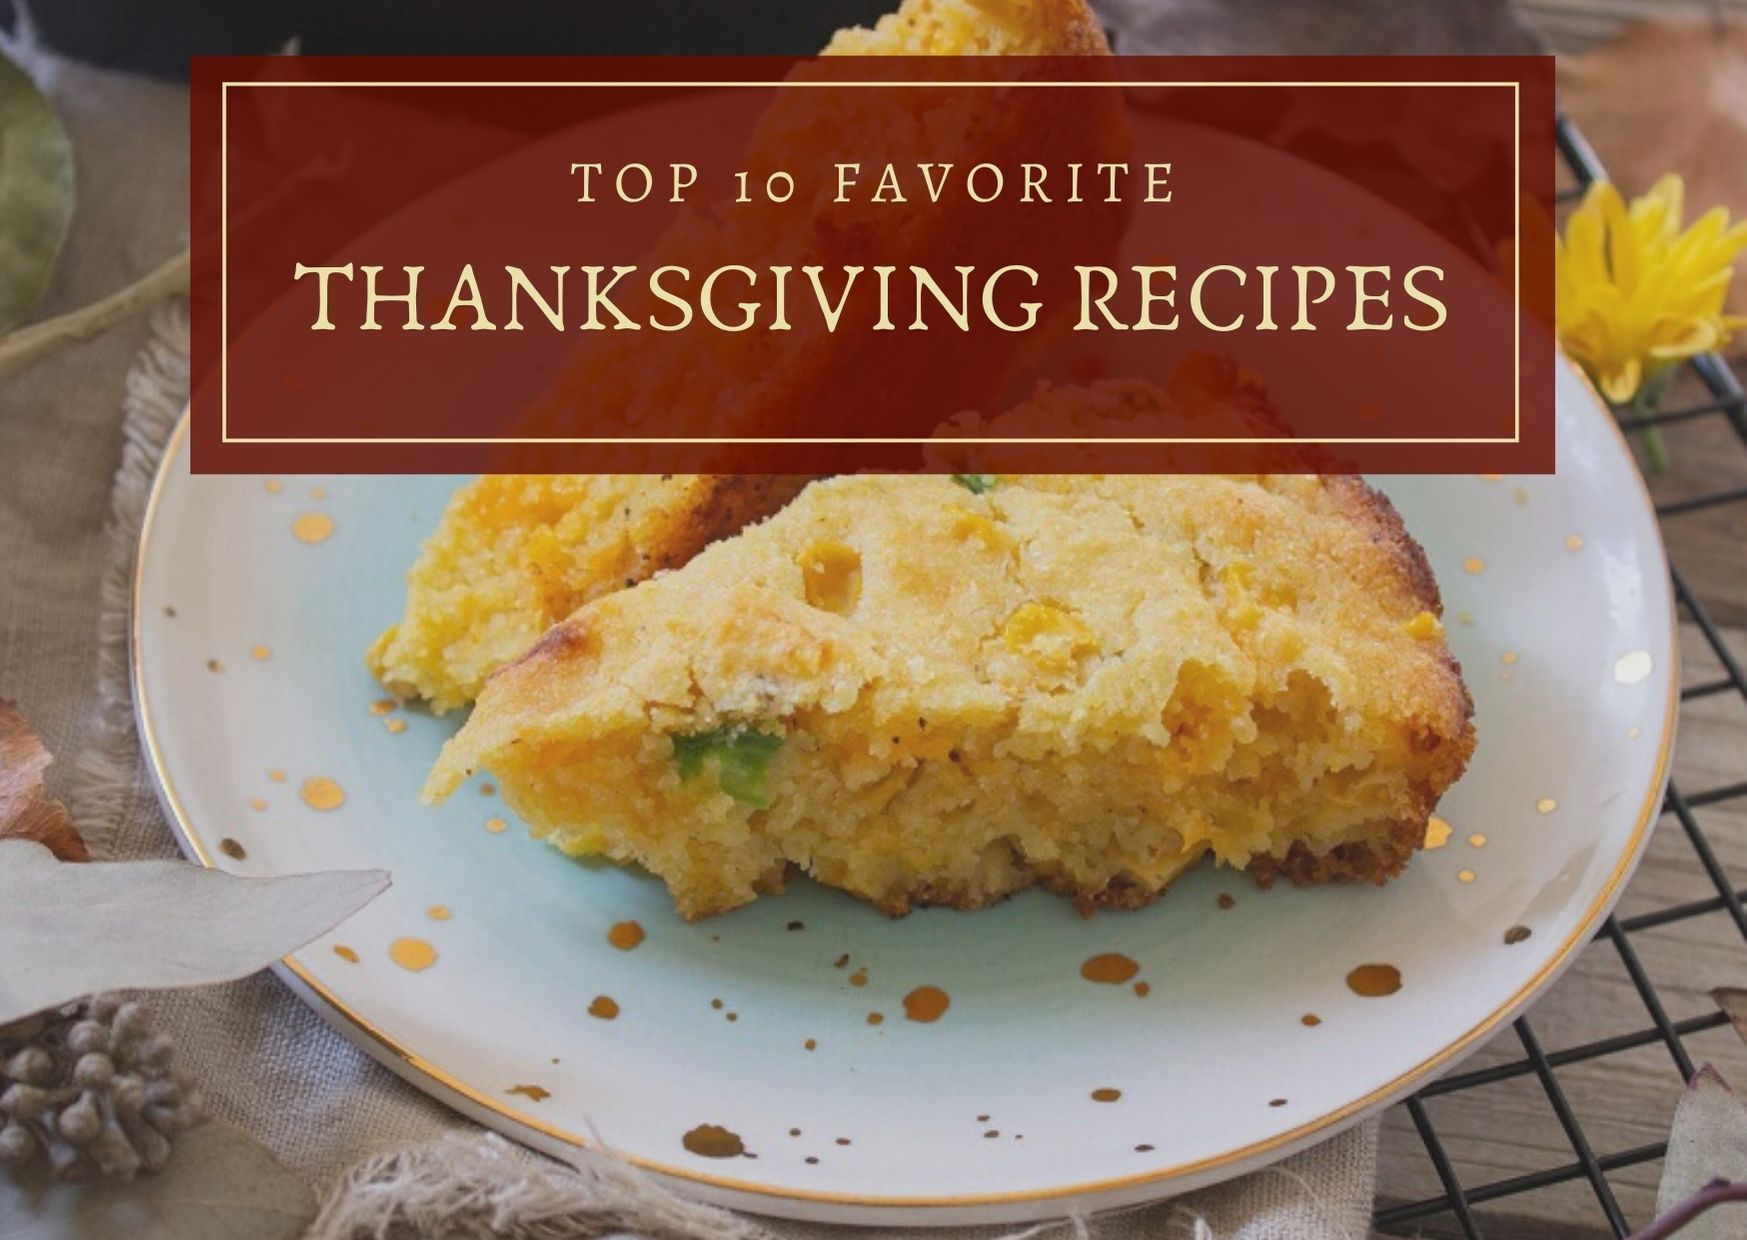 Top 10 Favorite Thanksgiving Recipes 2020